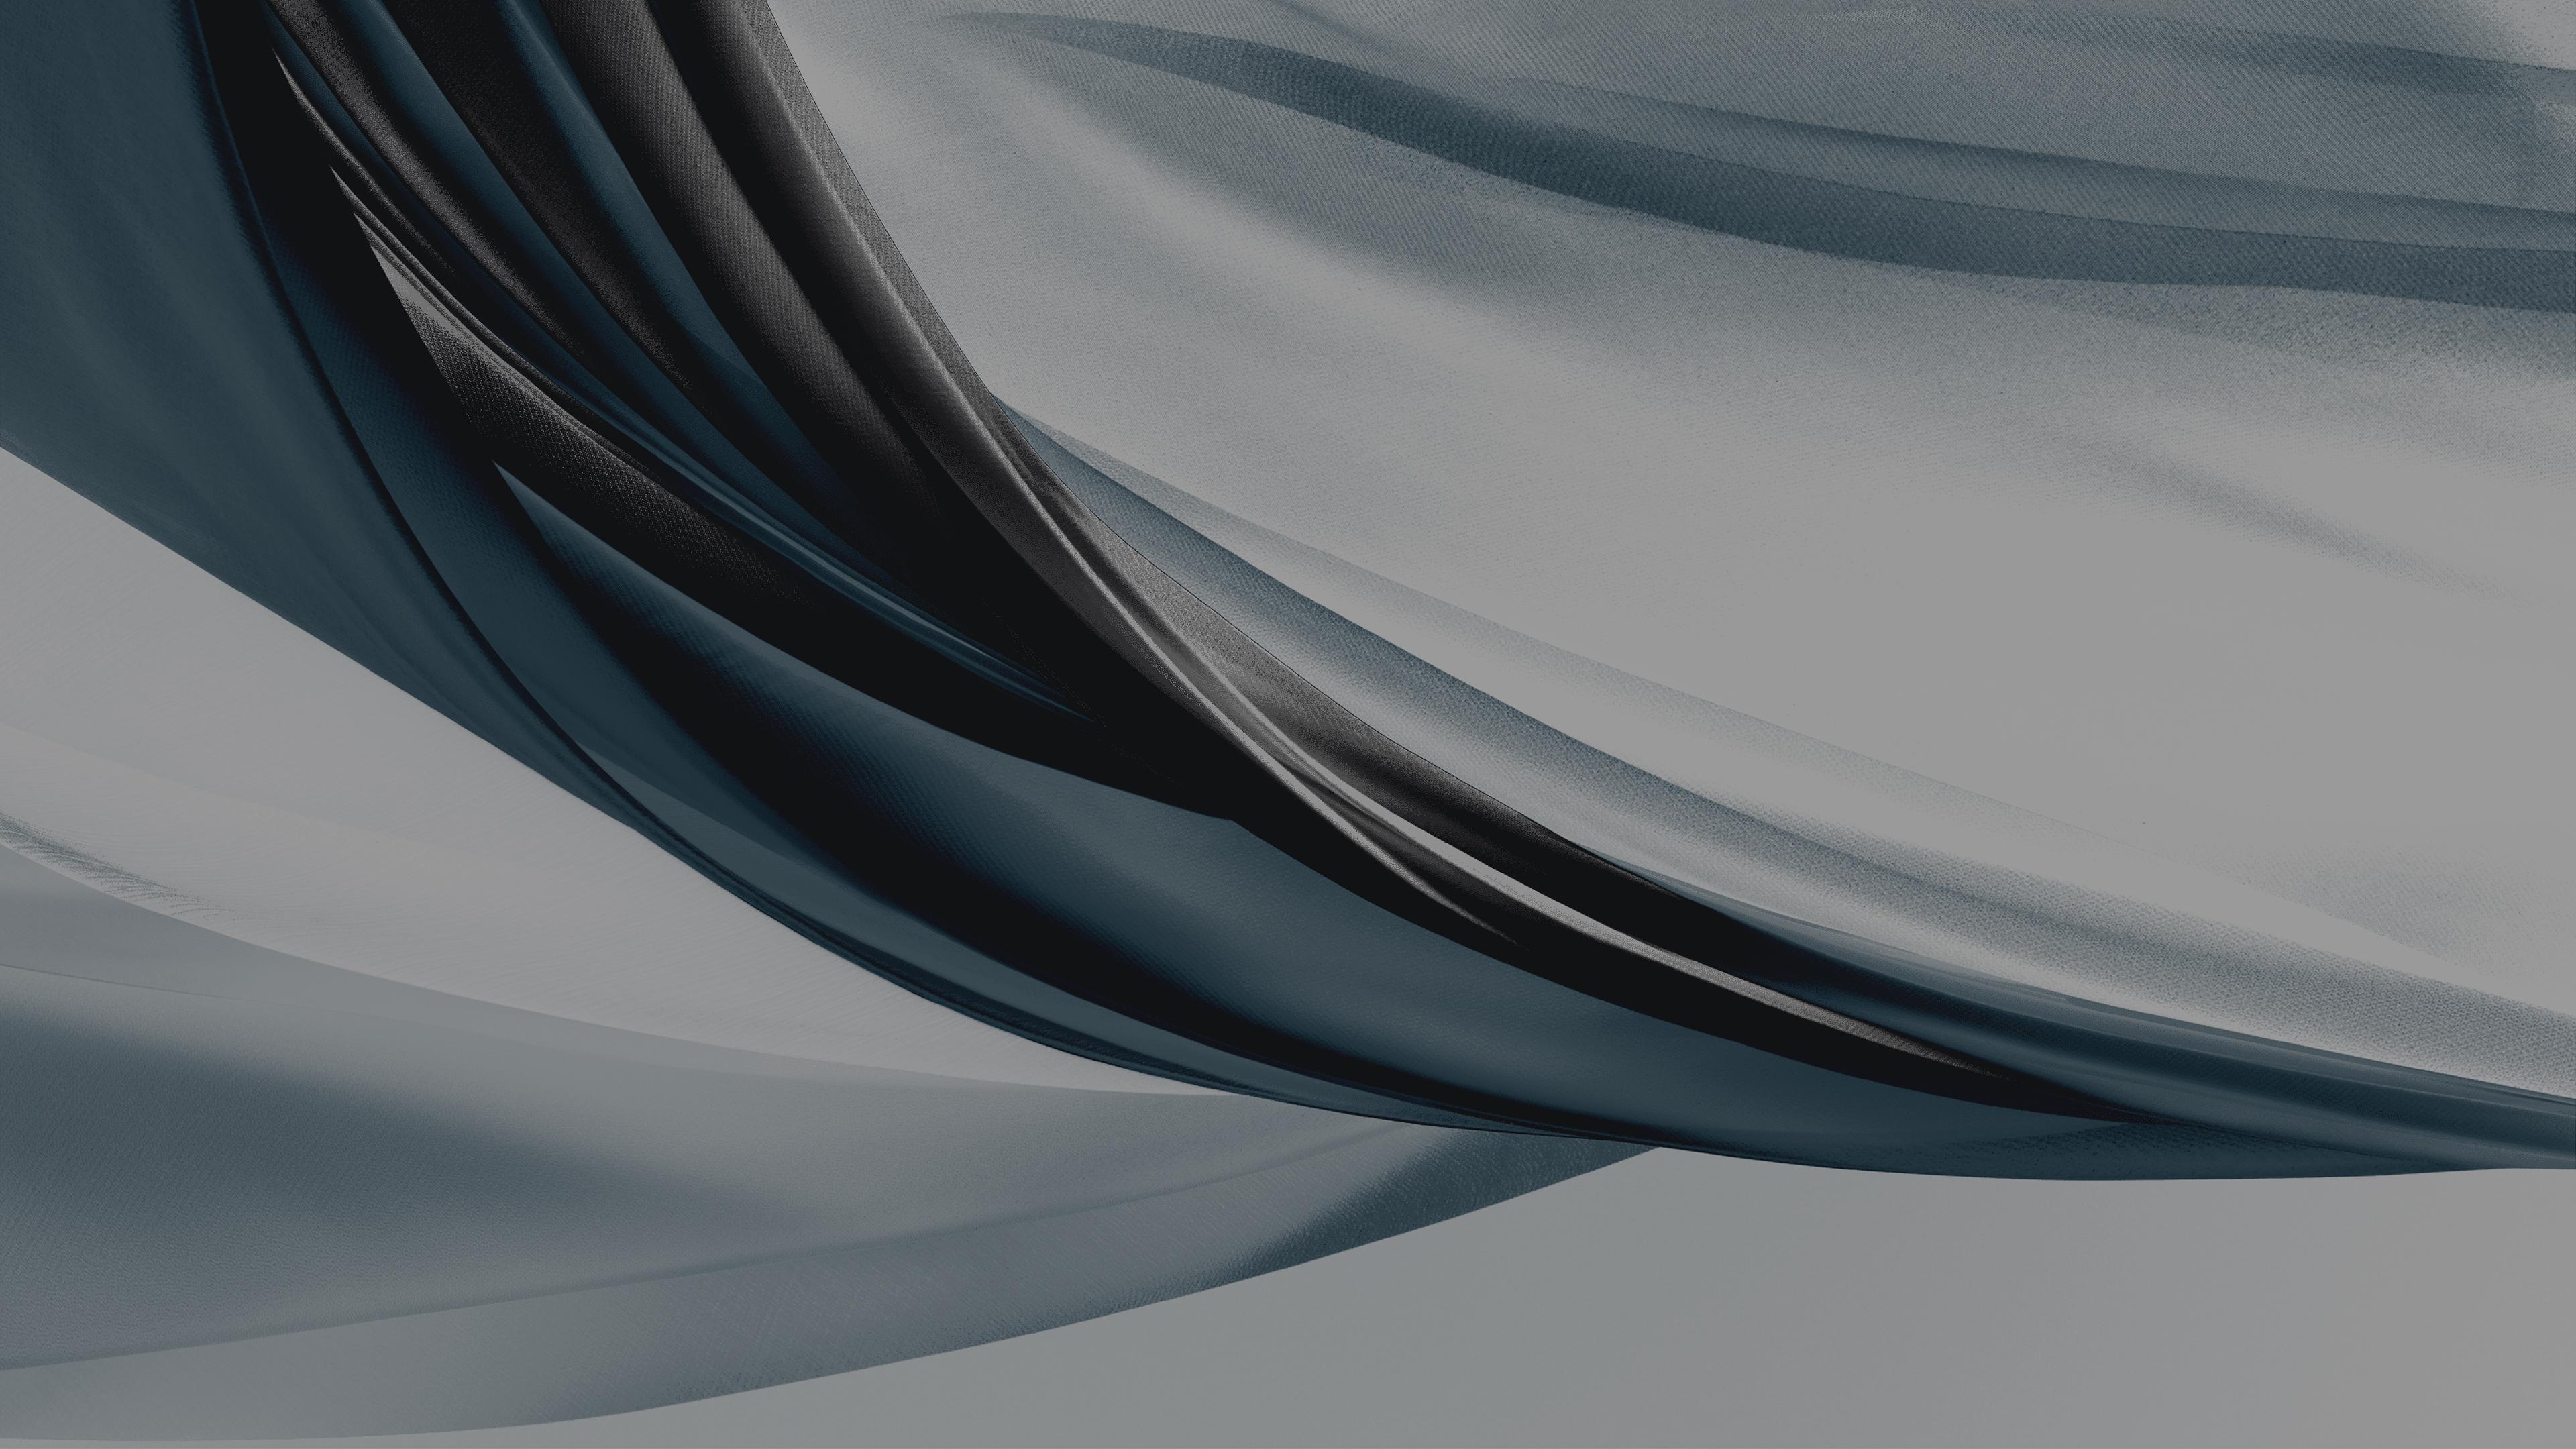 abstract curtains waves 4k 1616870926 - Abstract Curtains Waves 4k - Abstract Curtains Waves 4k wallpapers